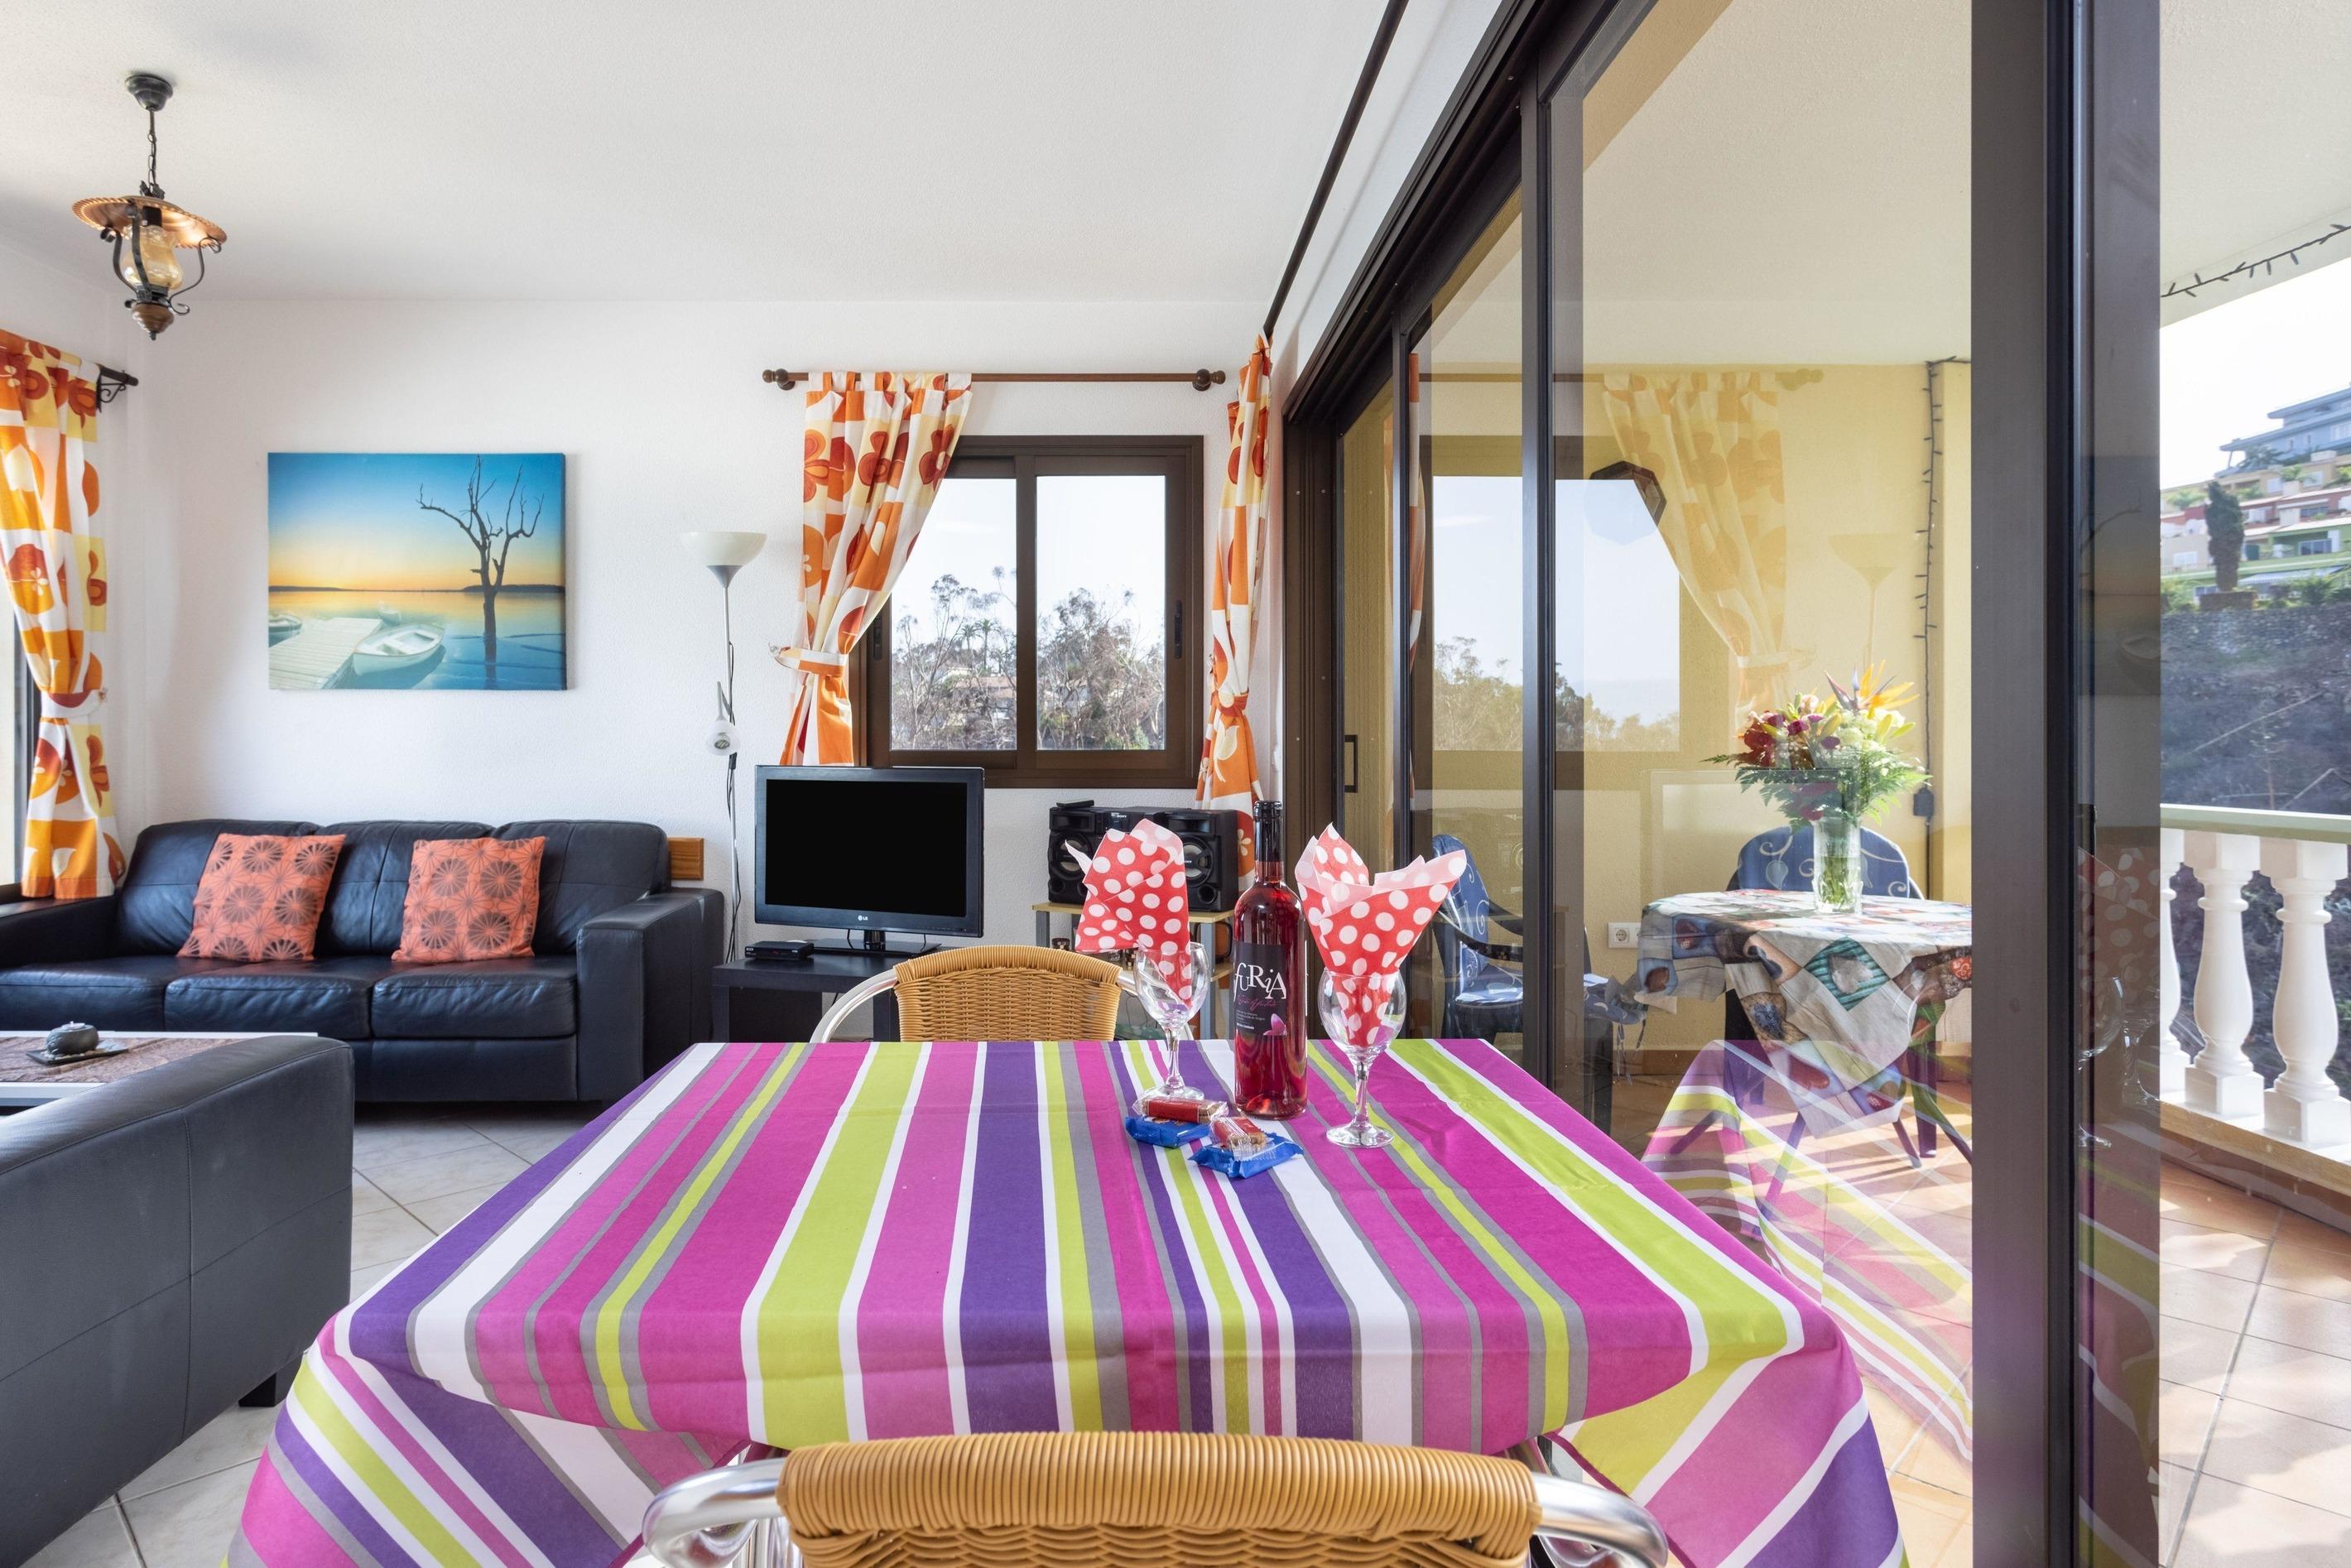 Appartement de vacances Fewo Atico Marazul, mit  Panorama- und Meerblick, Pool, Terrasse, Grill, Parkplatz und WLA (2492979), Santa Ursula, Ténérife, Iles Canaries, Espagne, image 3